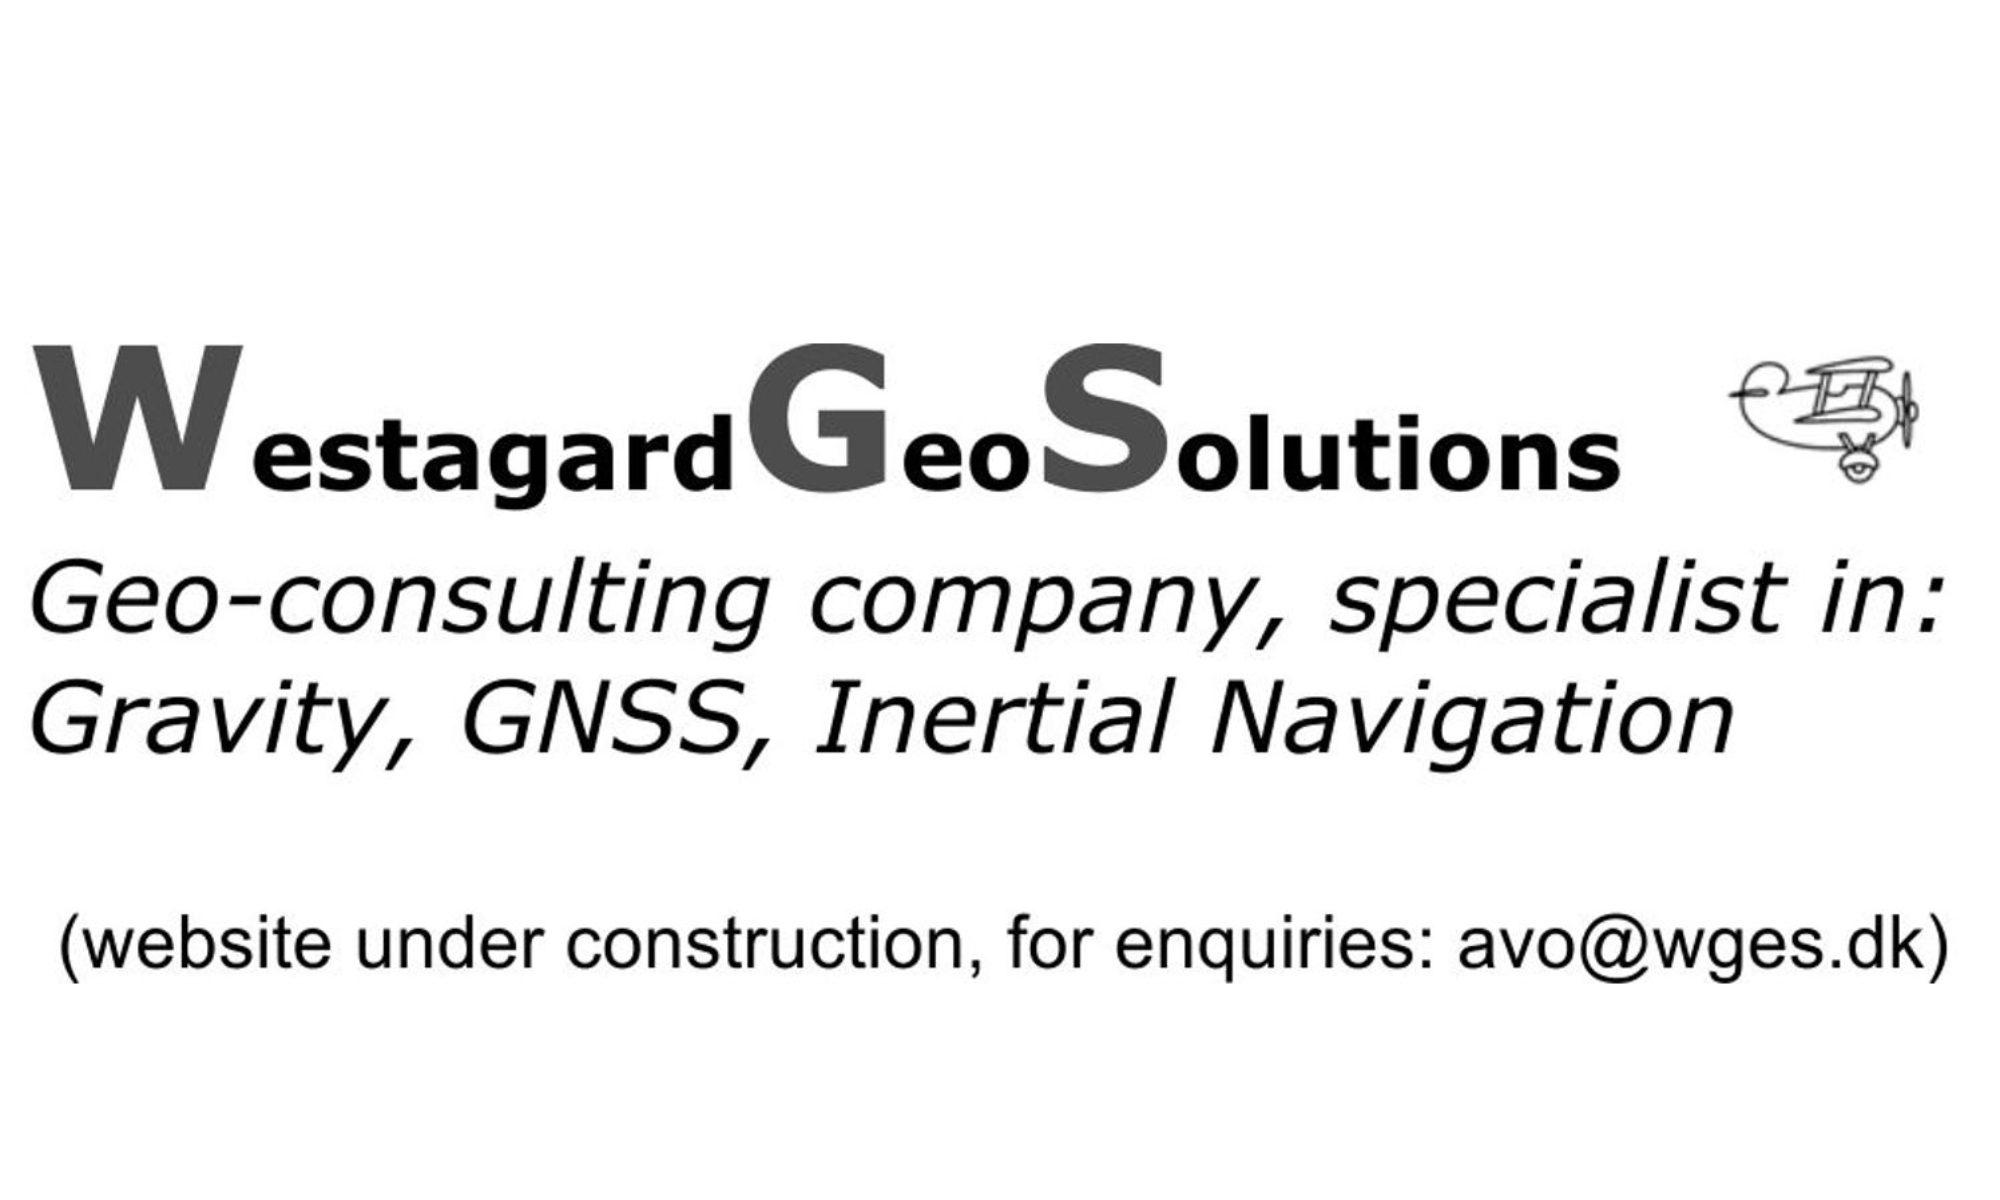 Westagard Geo Solutions